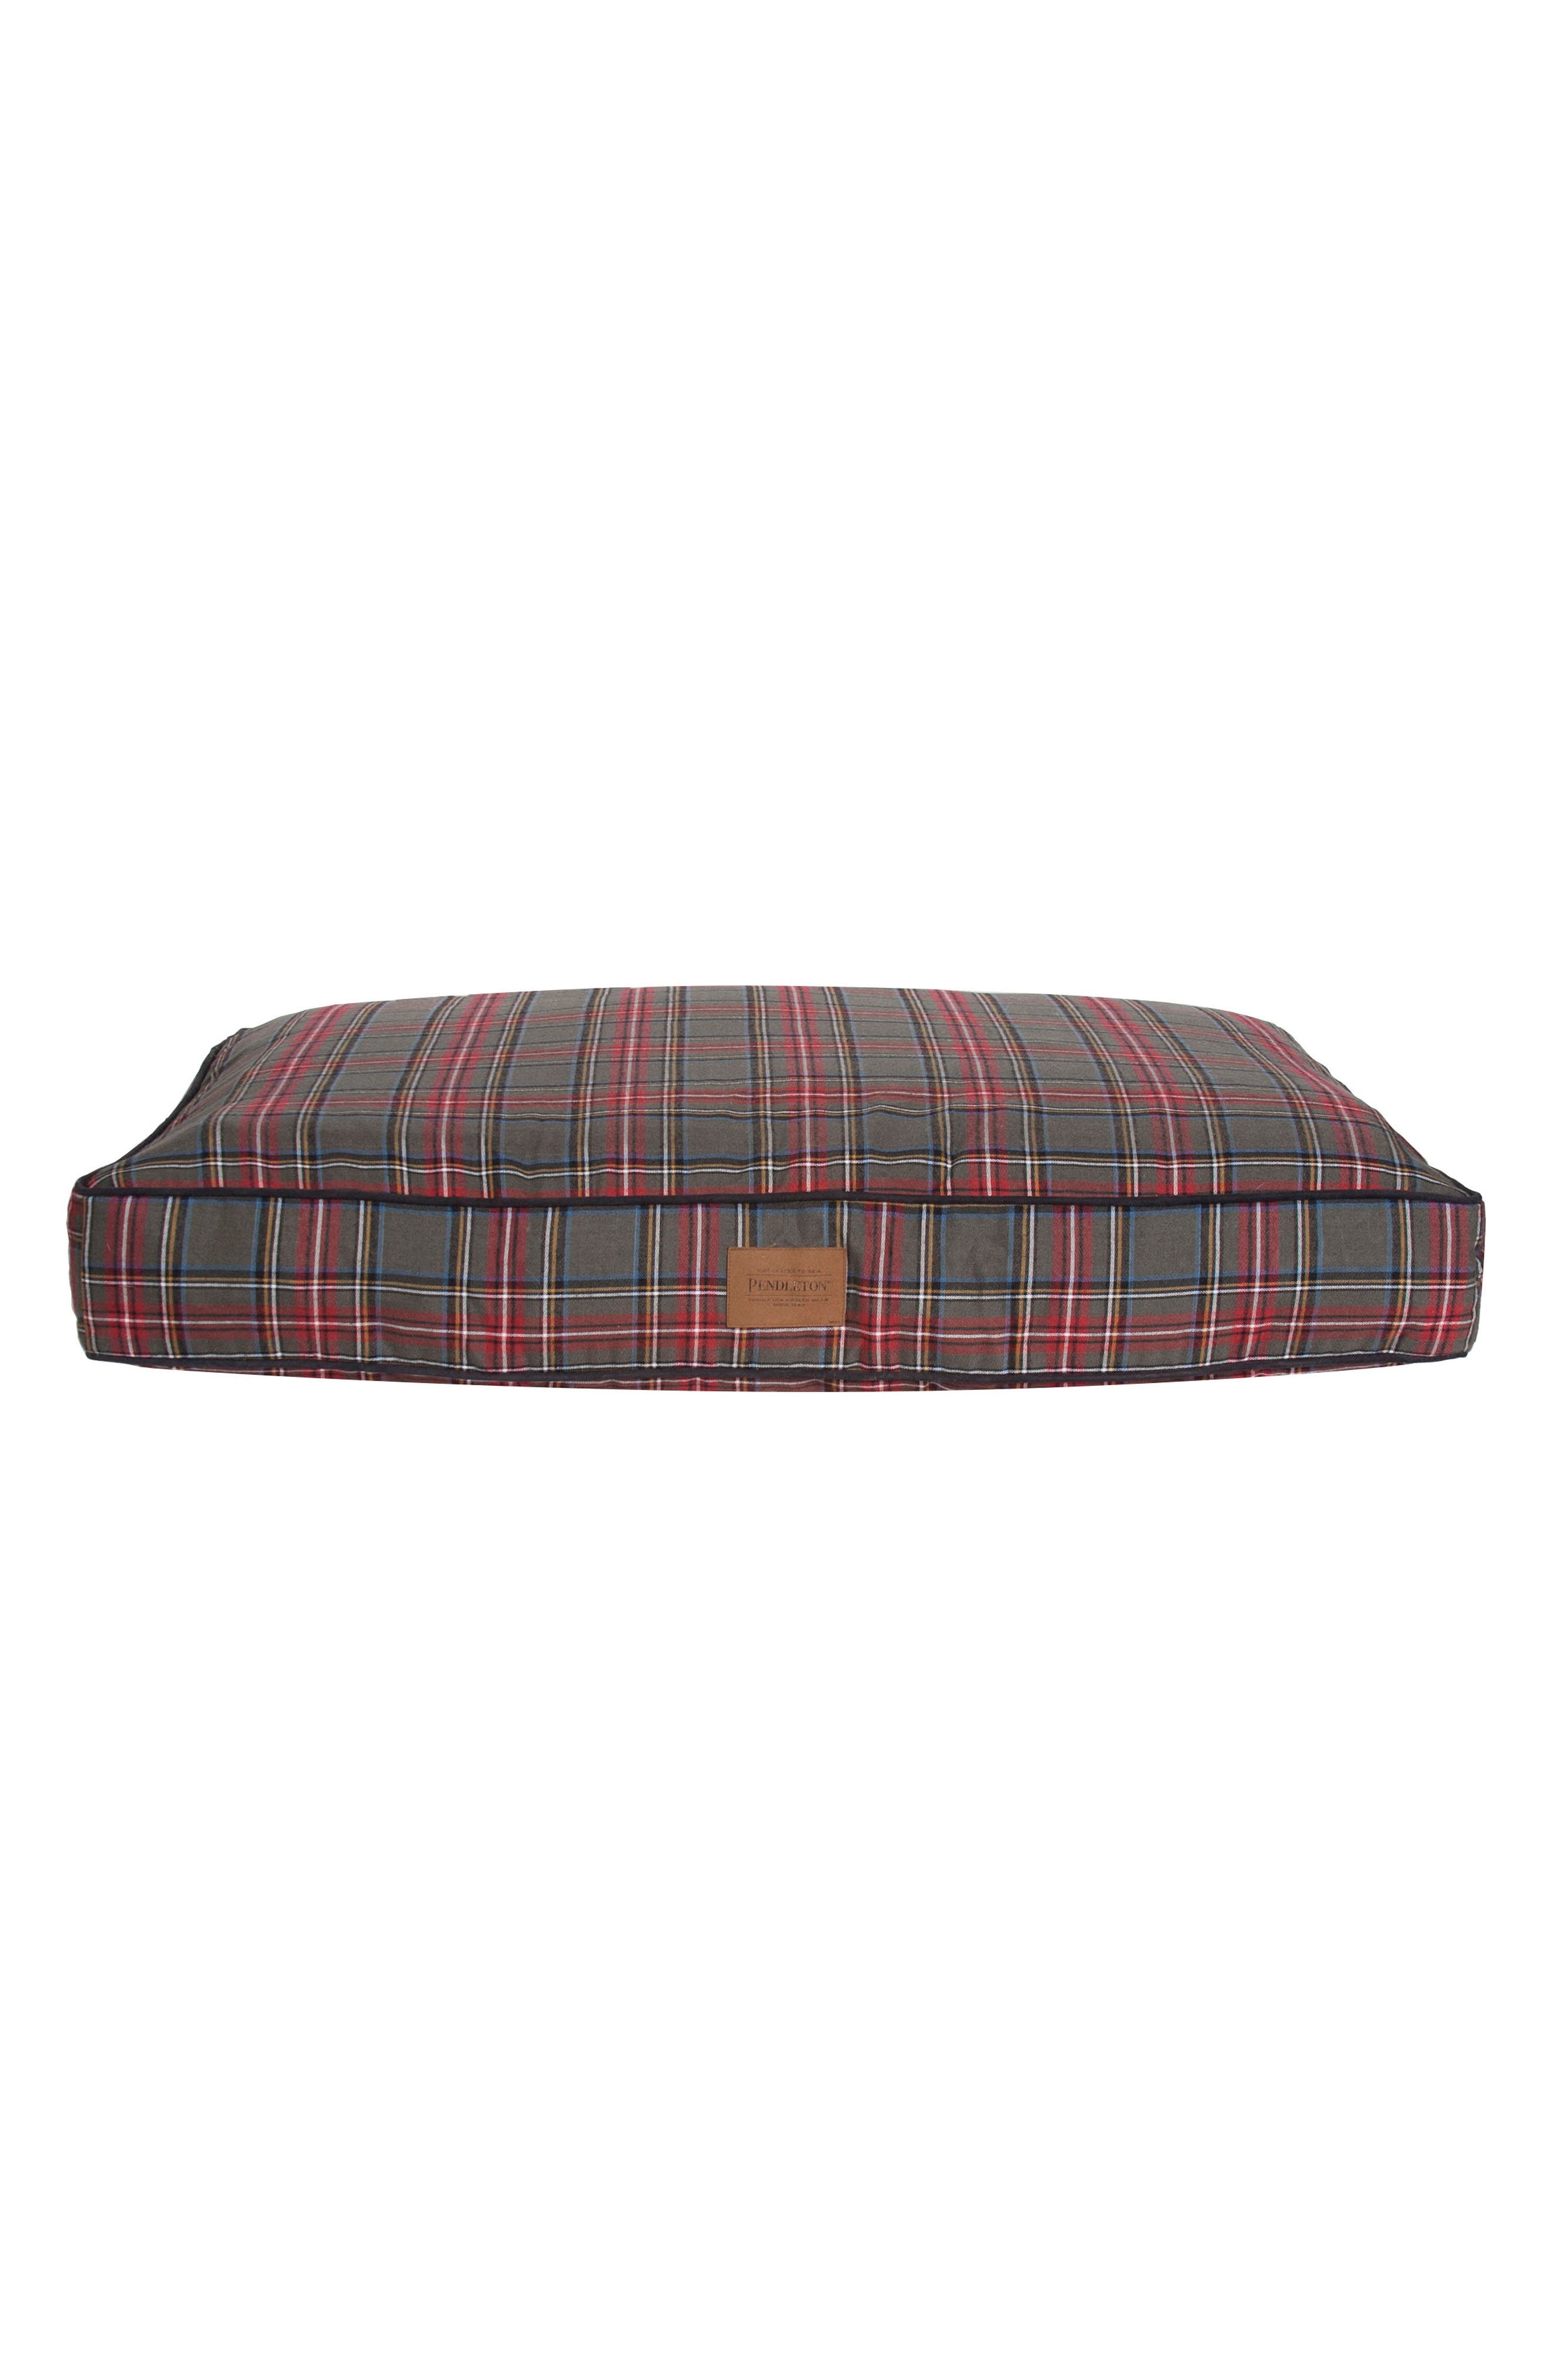 Alternate Image 1 Selected - Carolina Pet Company x Pendleton Classics Tartan Pet Bed